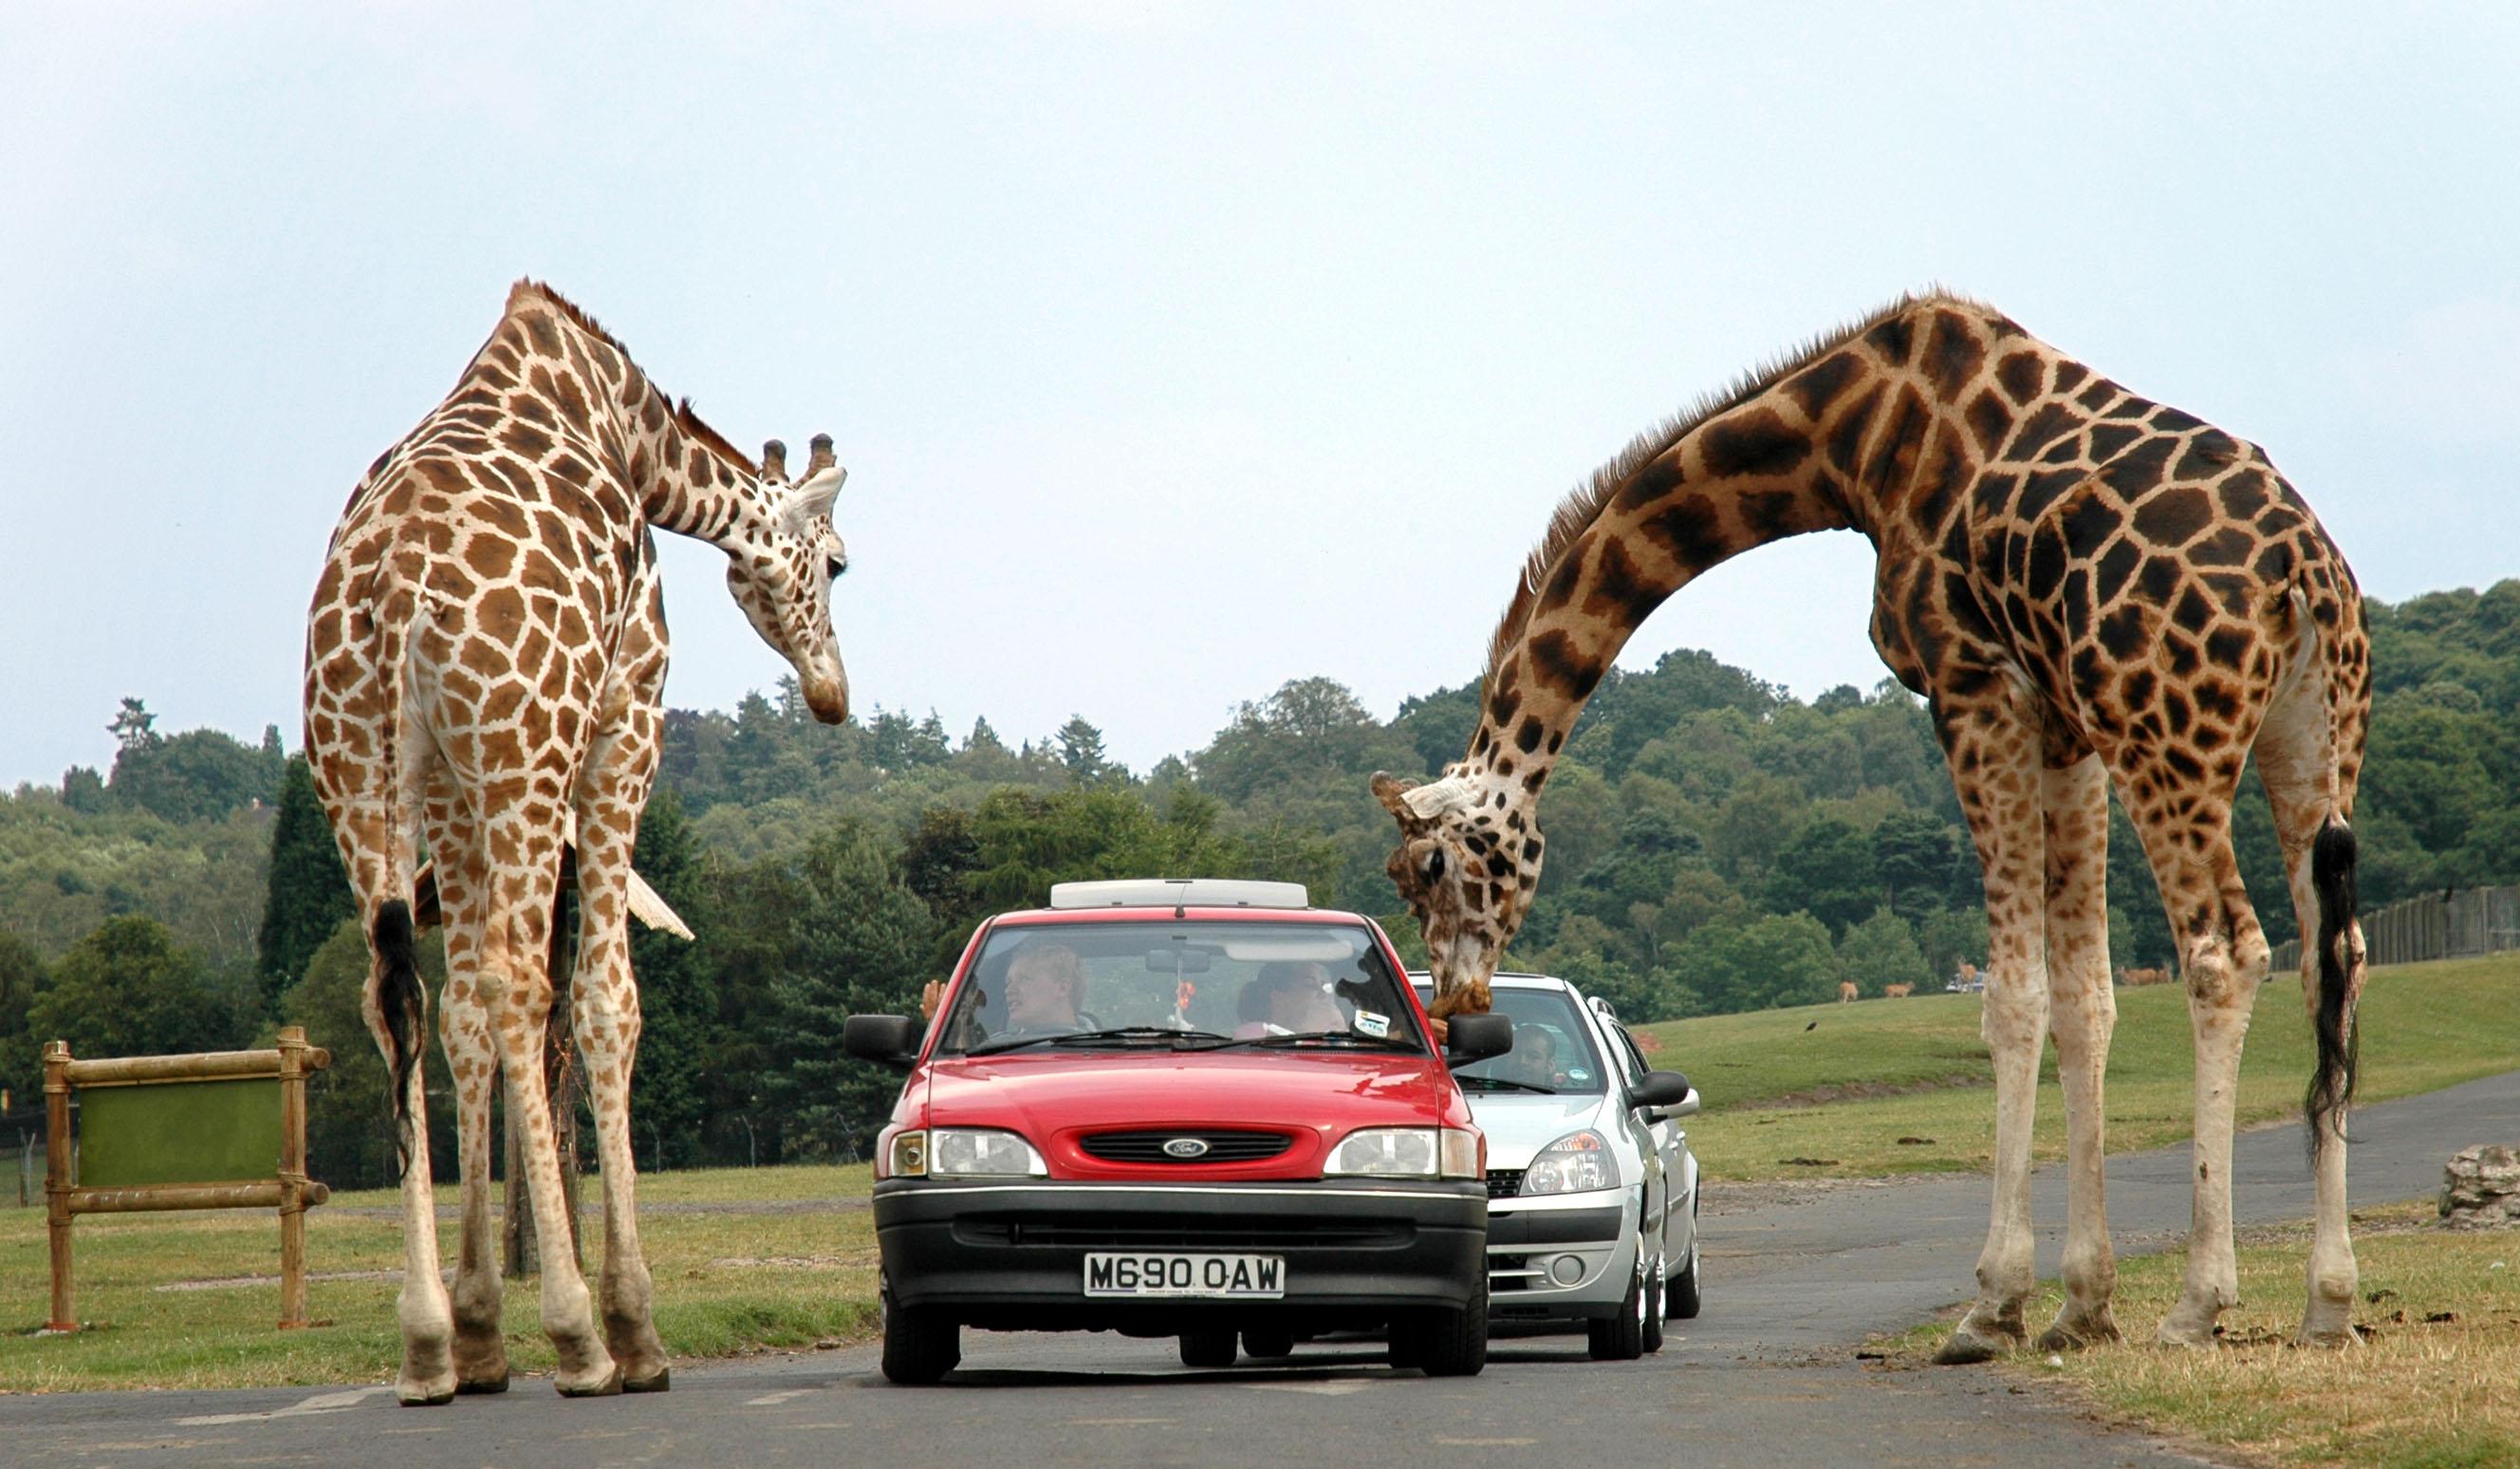 Giraffes at west midlands safari park